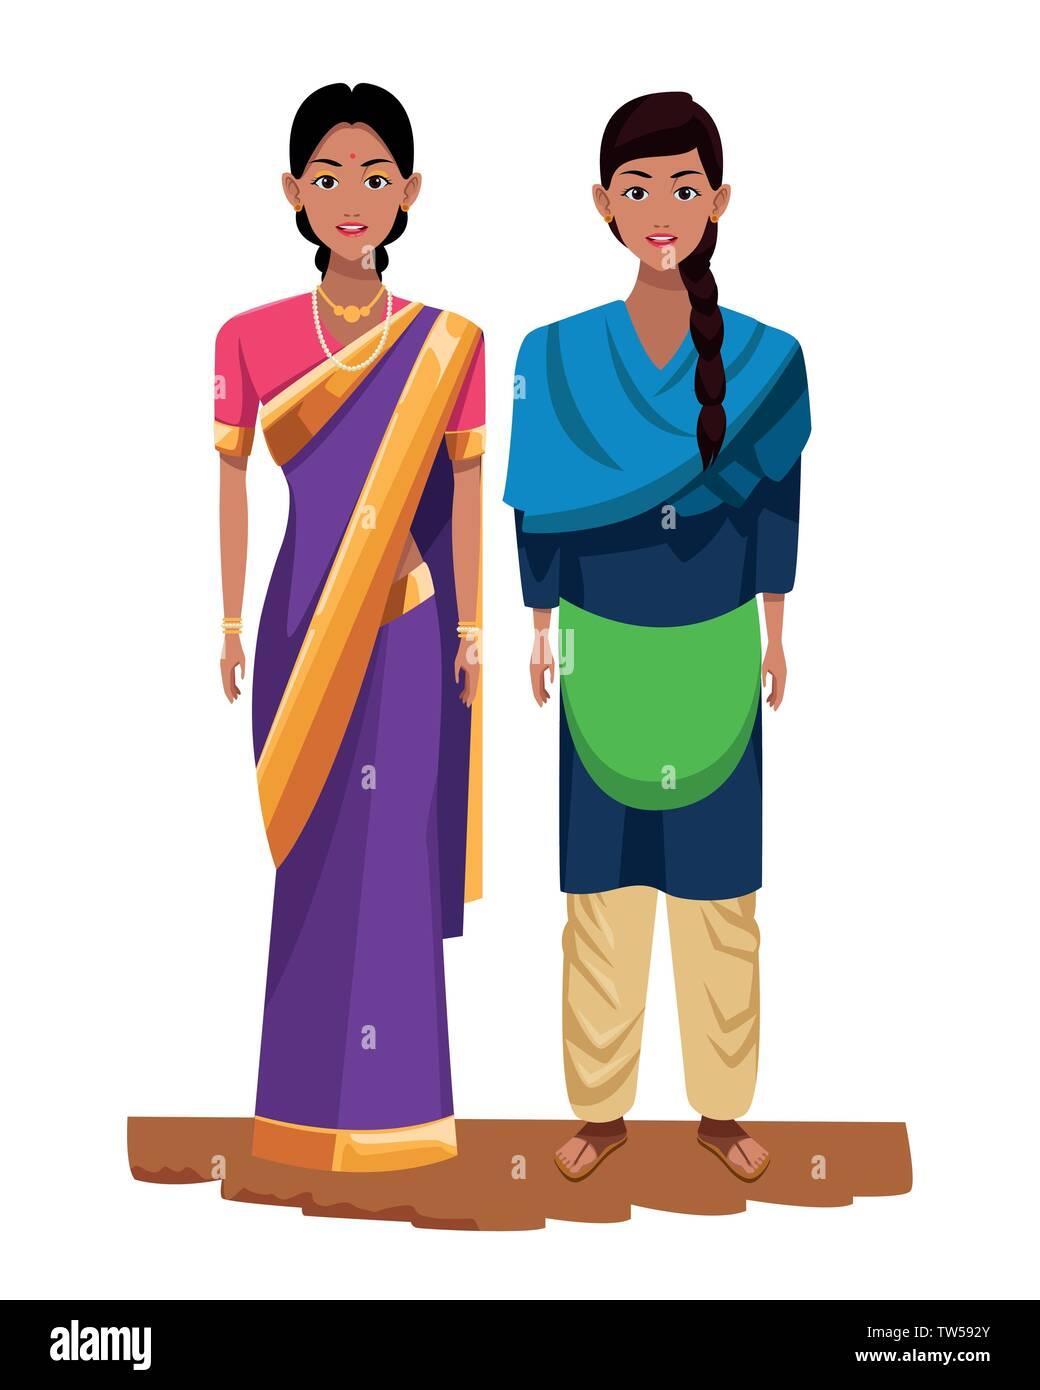 Indian Women Avatar Cartoon Character Stock Vector Image Art Alamy